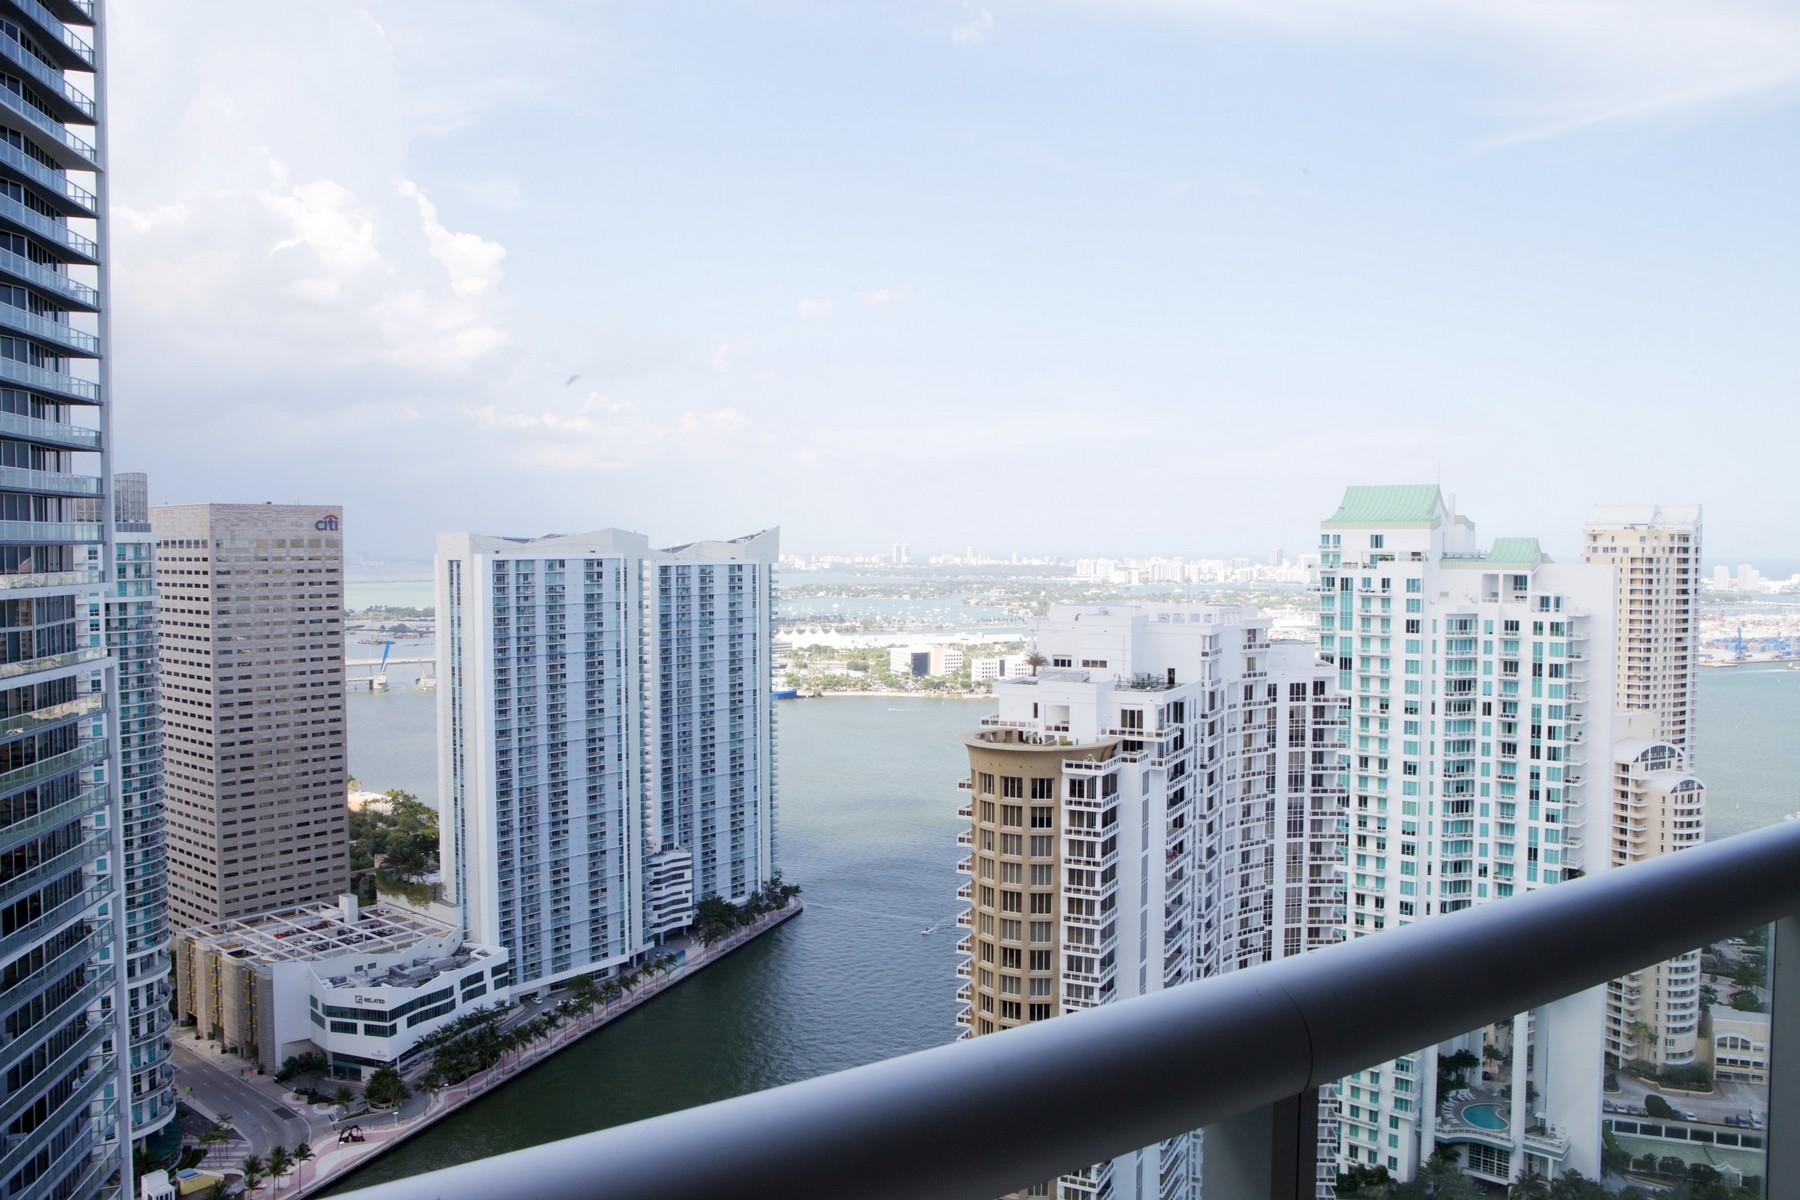 Condominium for Sale at 495 Brickell Ave #4304 495 Brickell Av 4304 Miami, Florida, 33131 United States